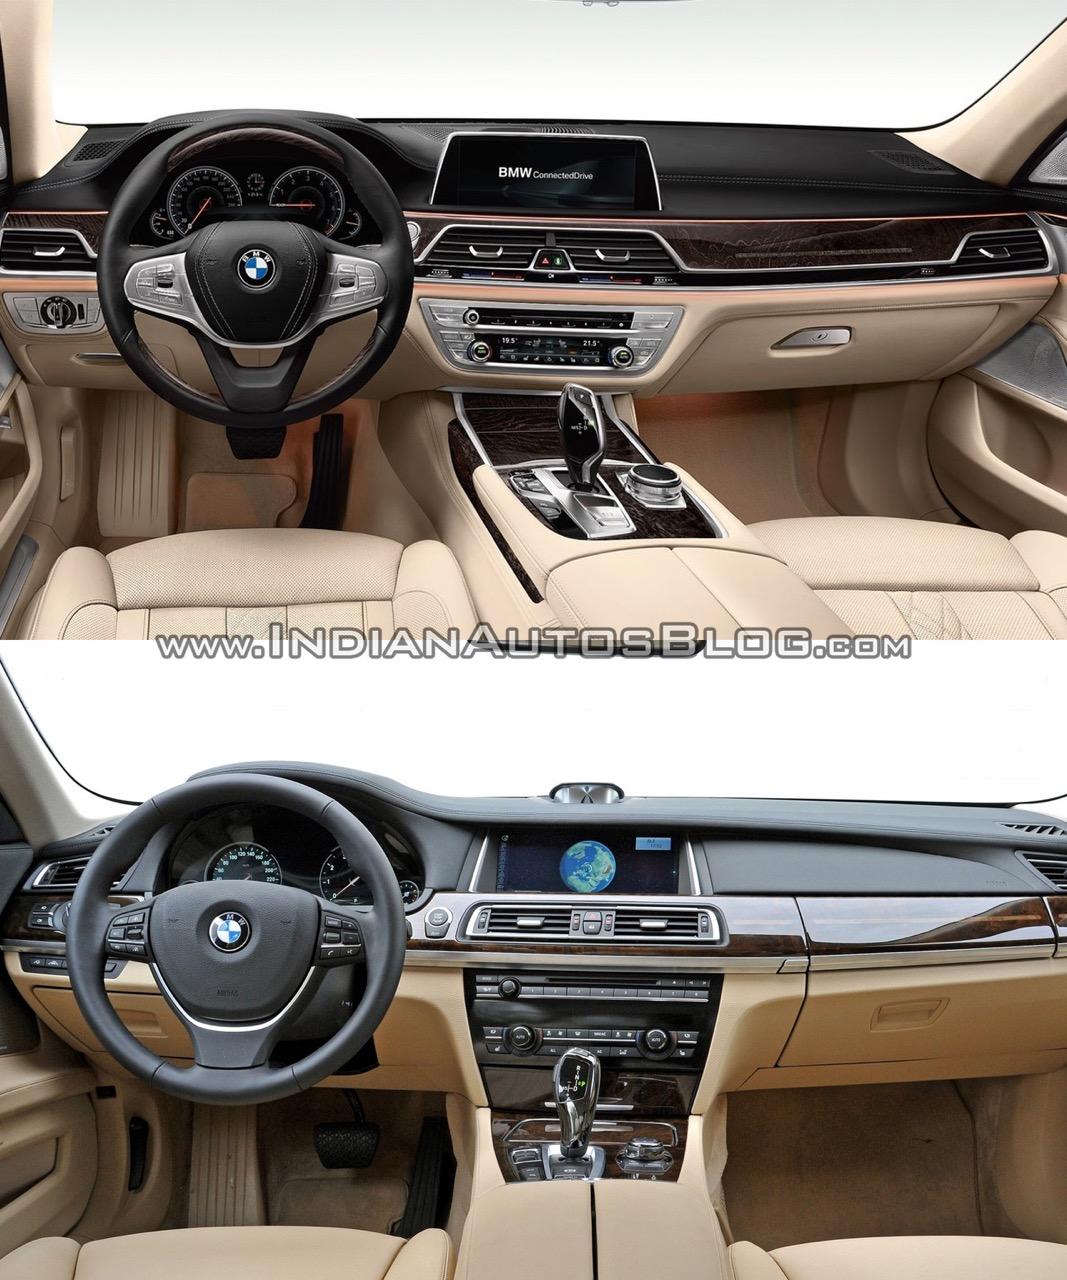 2016 BMW 7 Series Vs 2014 BMW 7 Series